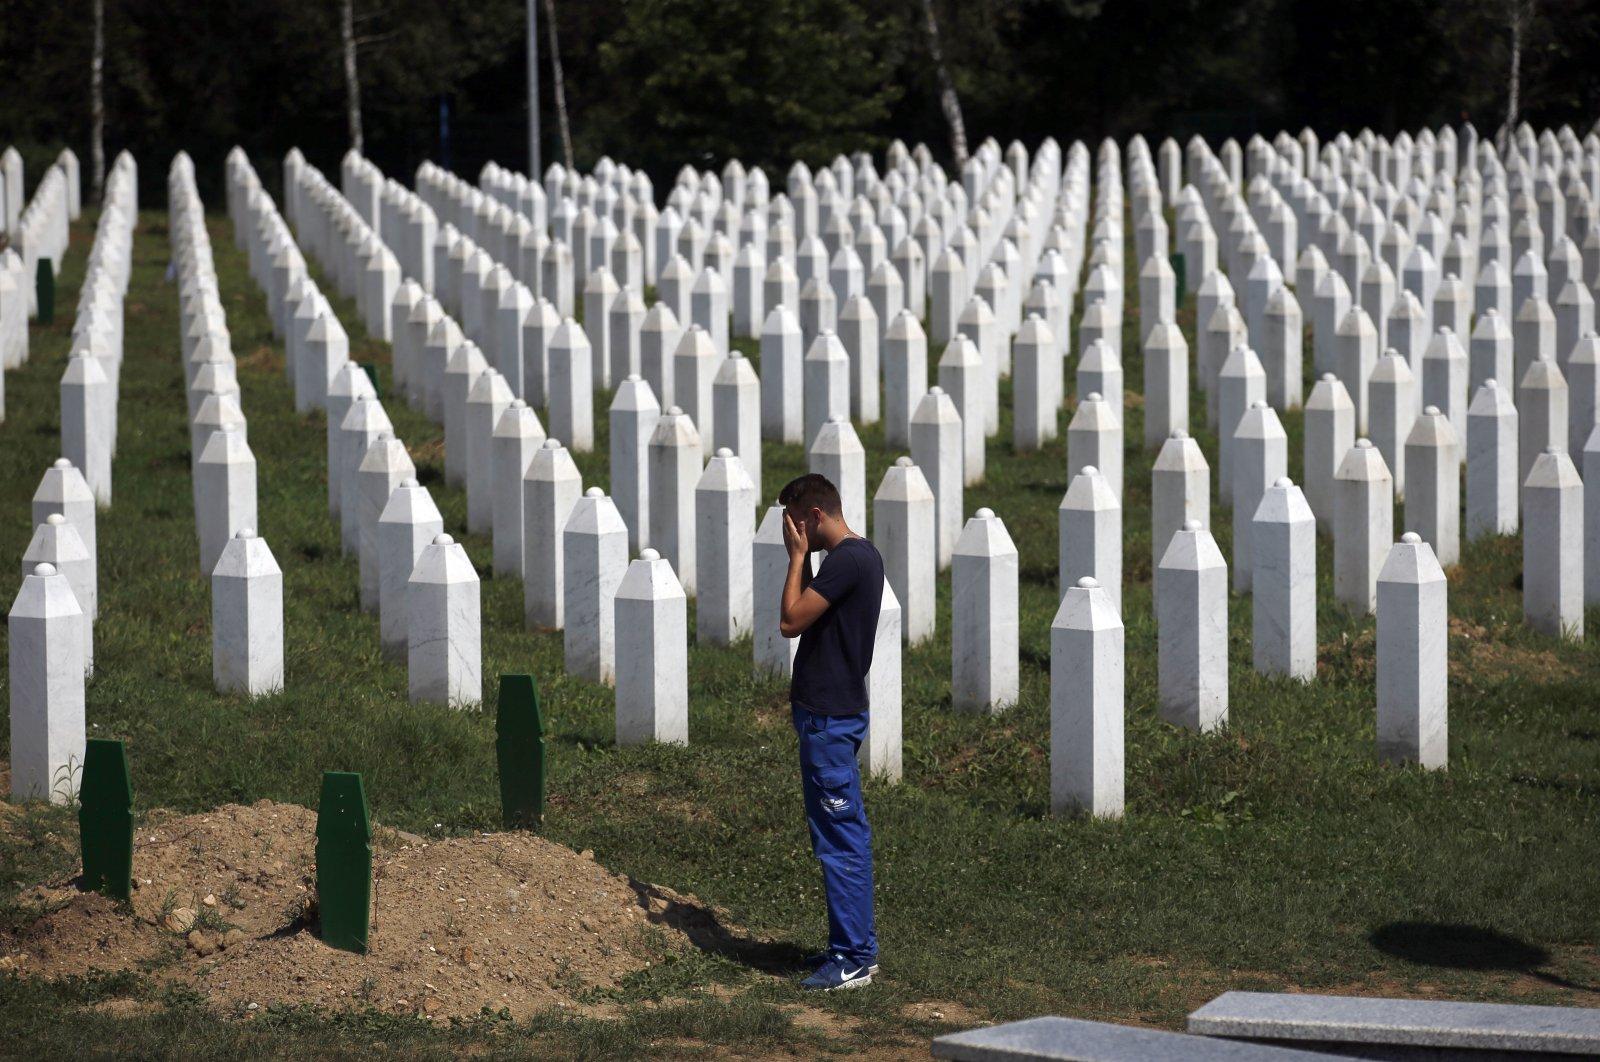 A man prays among gravestones at the memorial centre of Potocari near Srebrenica, 150 kms north east of Sarajevo, Bosnia-Herzegovina, Aug. 14, 2018. AP Photo)